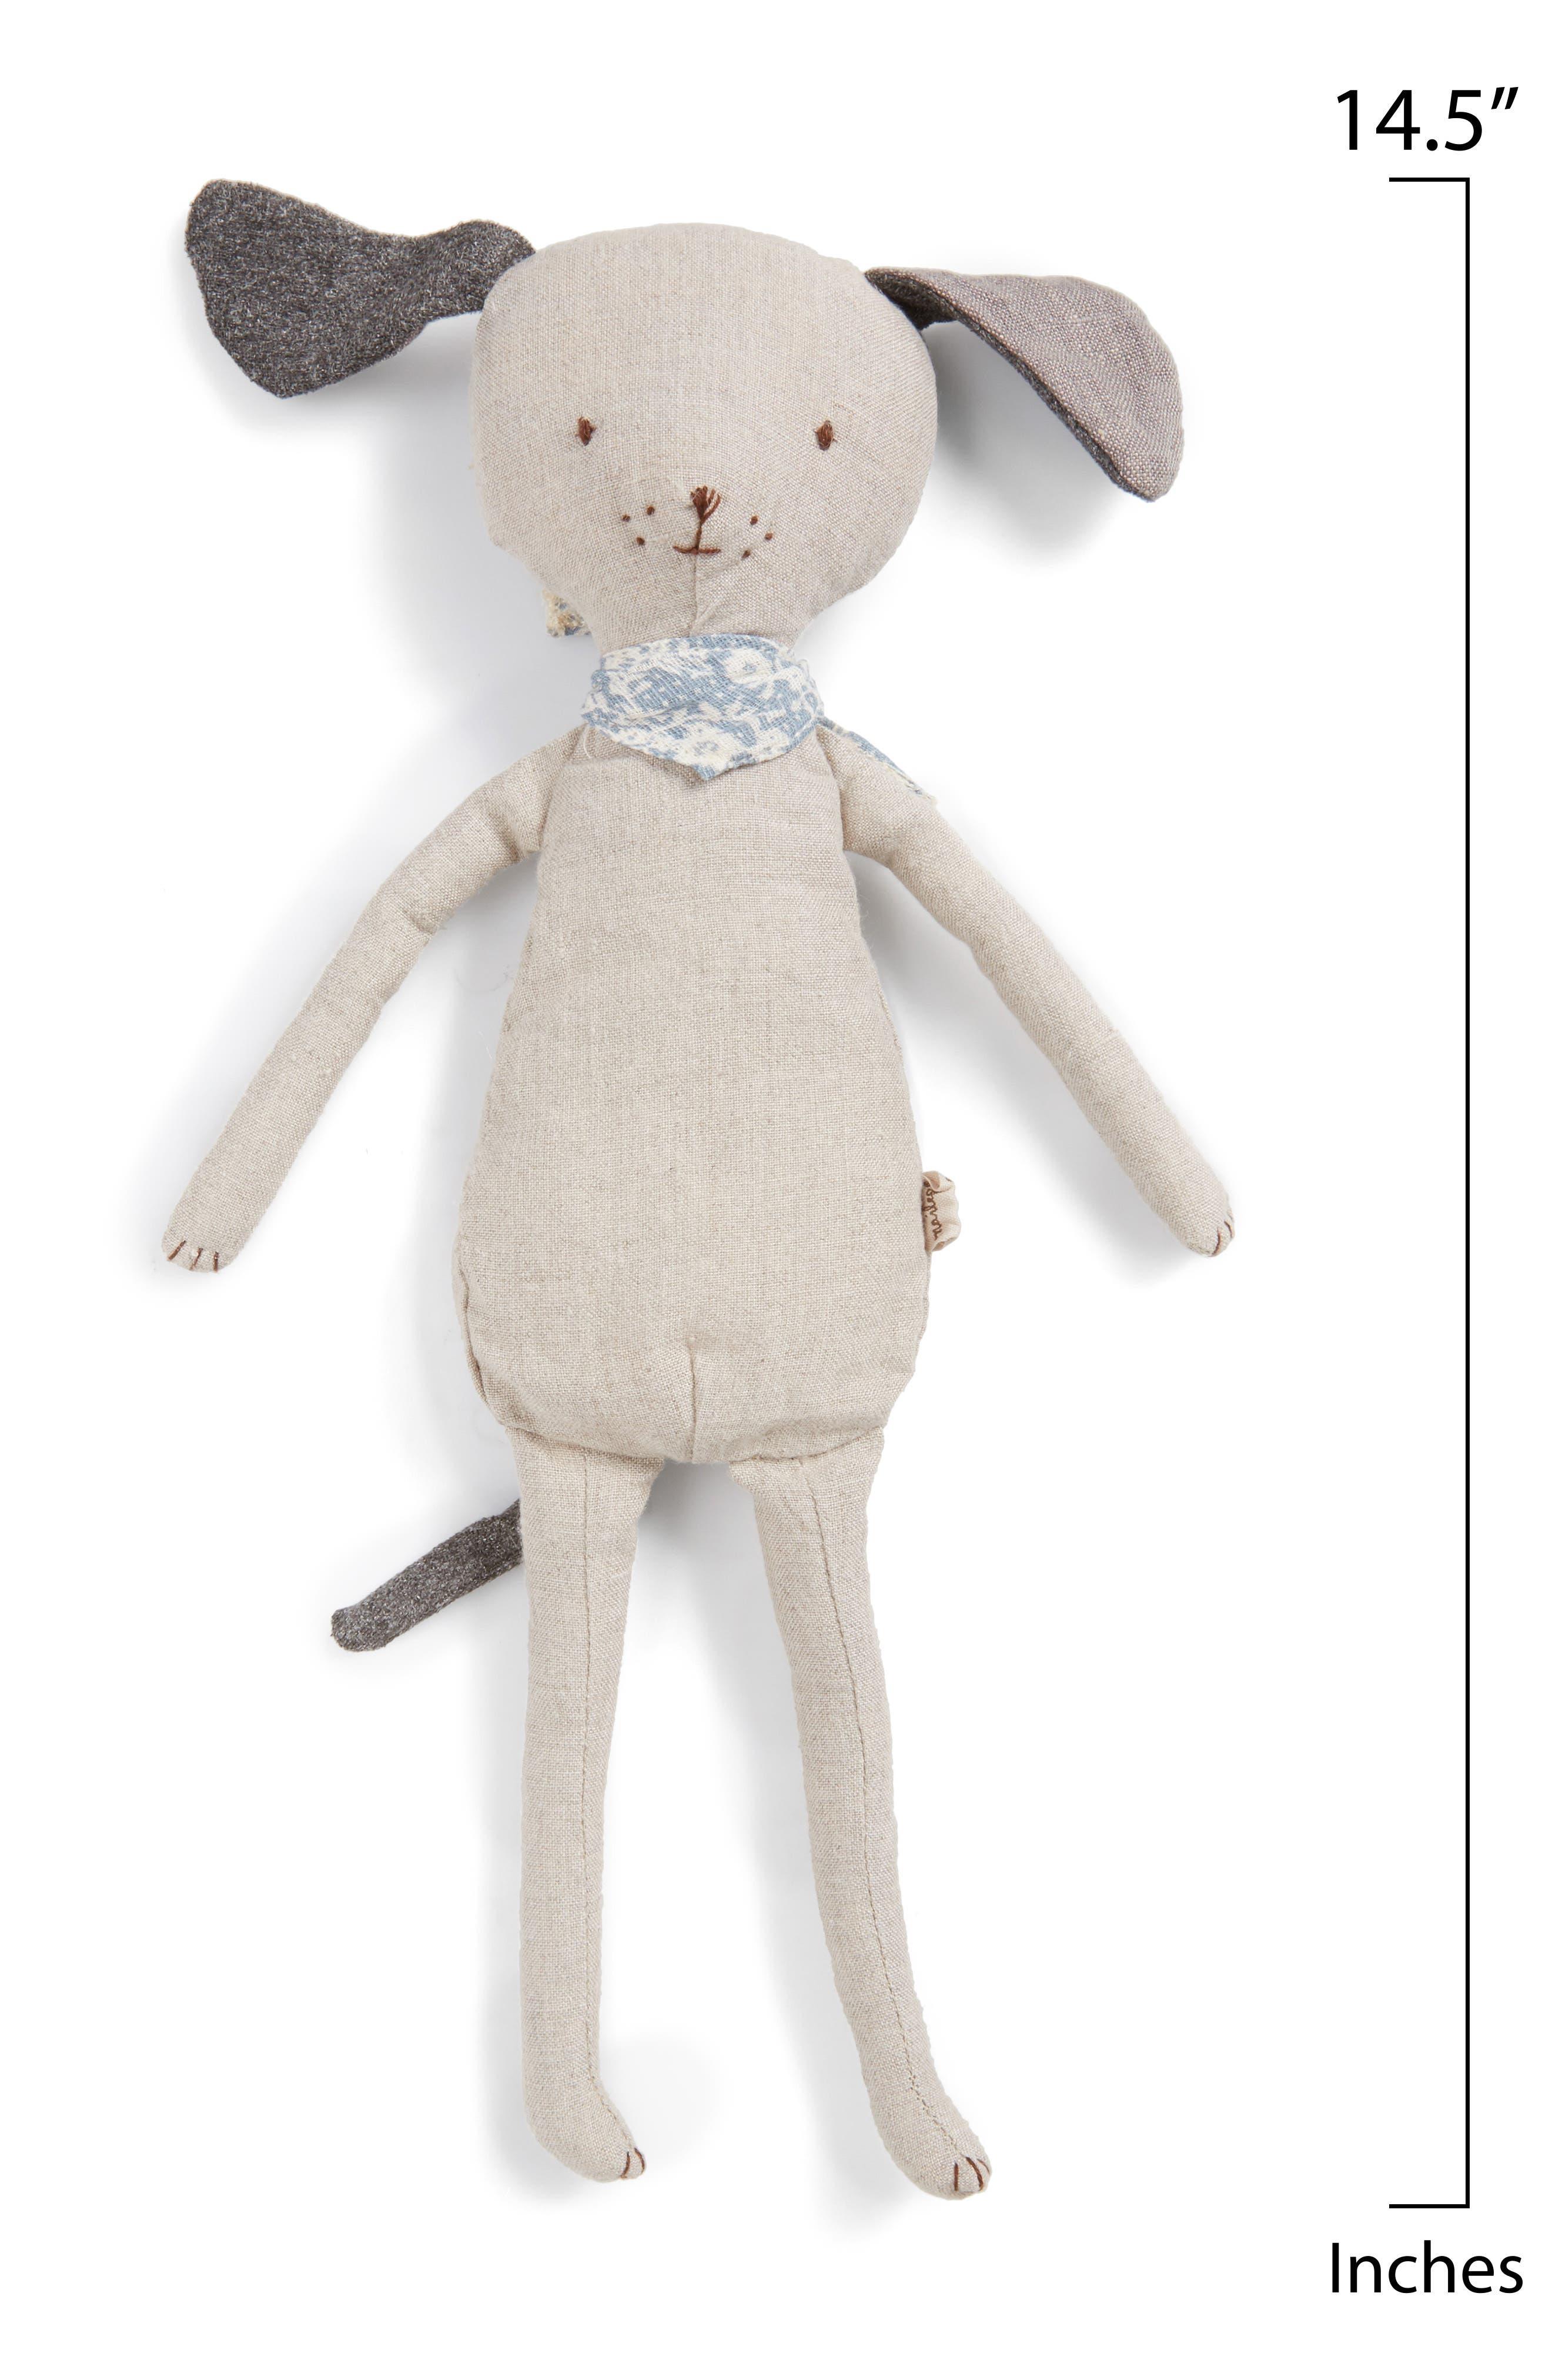 Best Friends Stuffed Dog,                             Alternate thumbnail 2, color,                             900